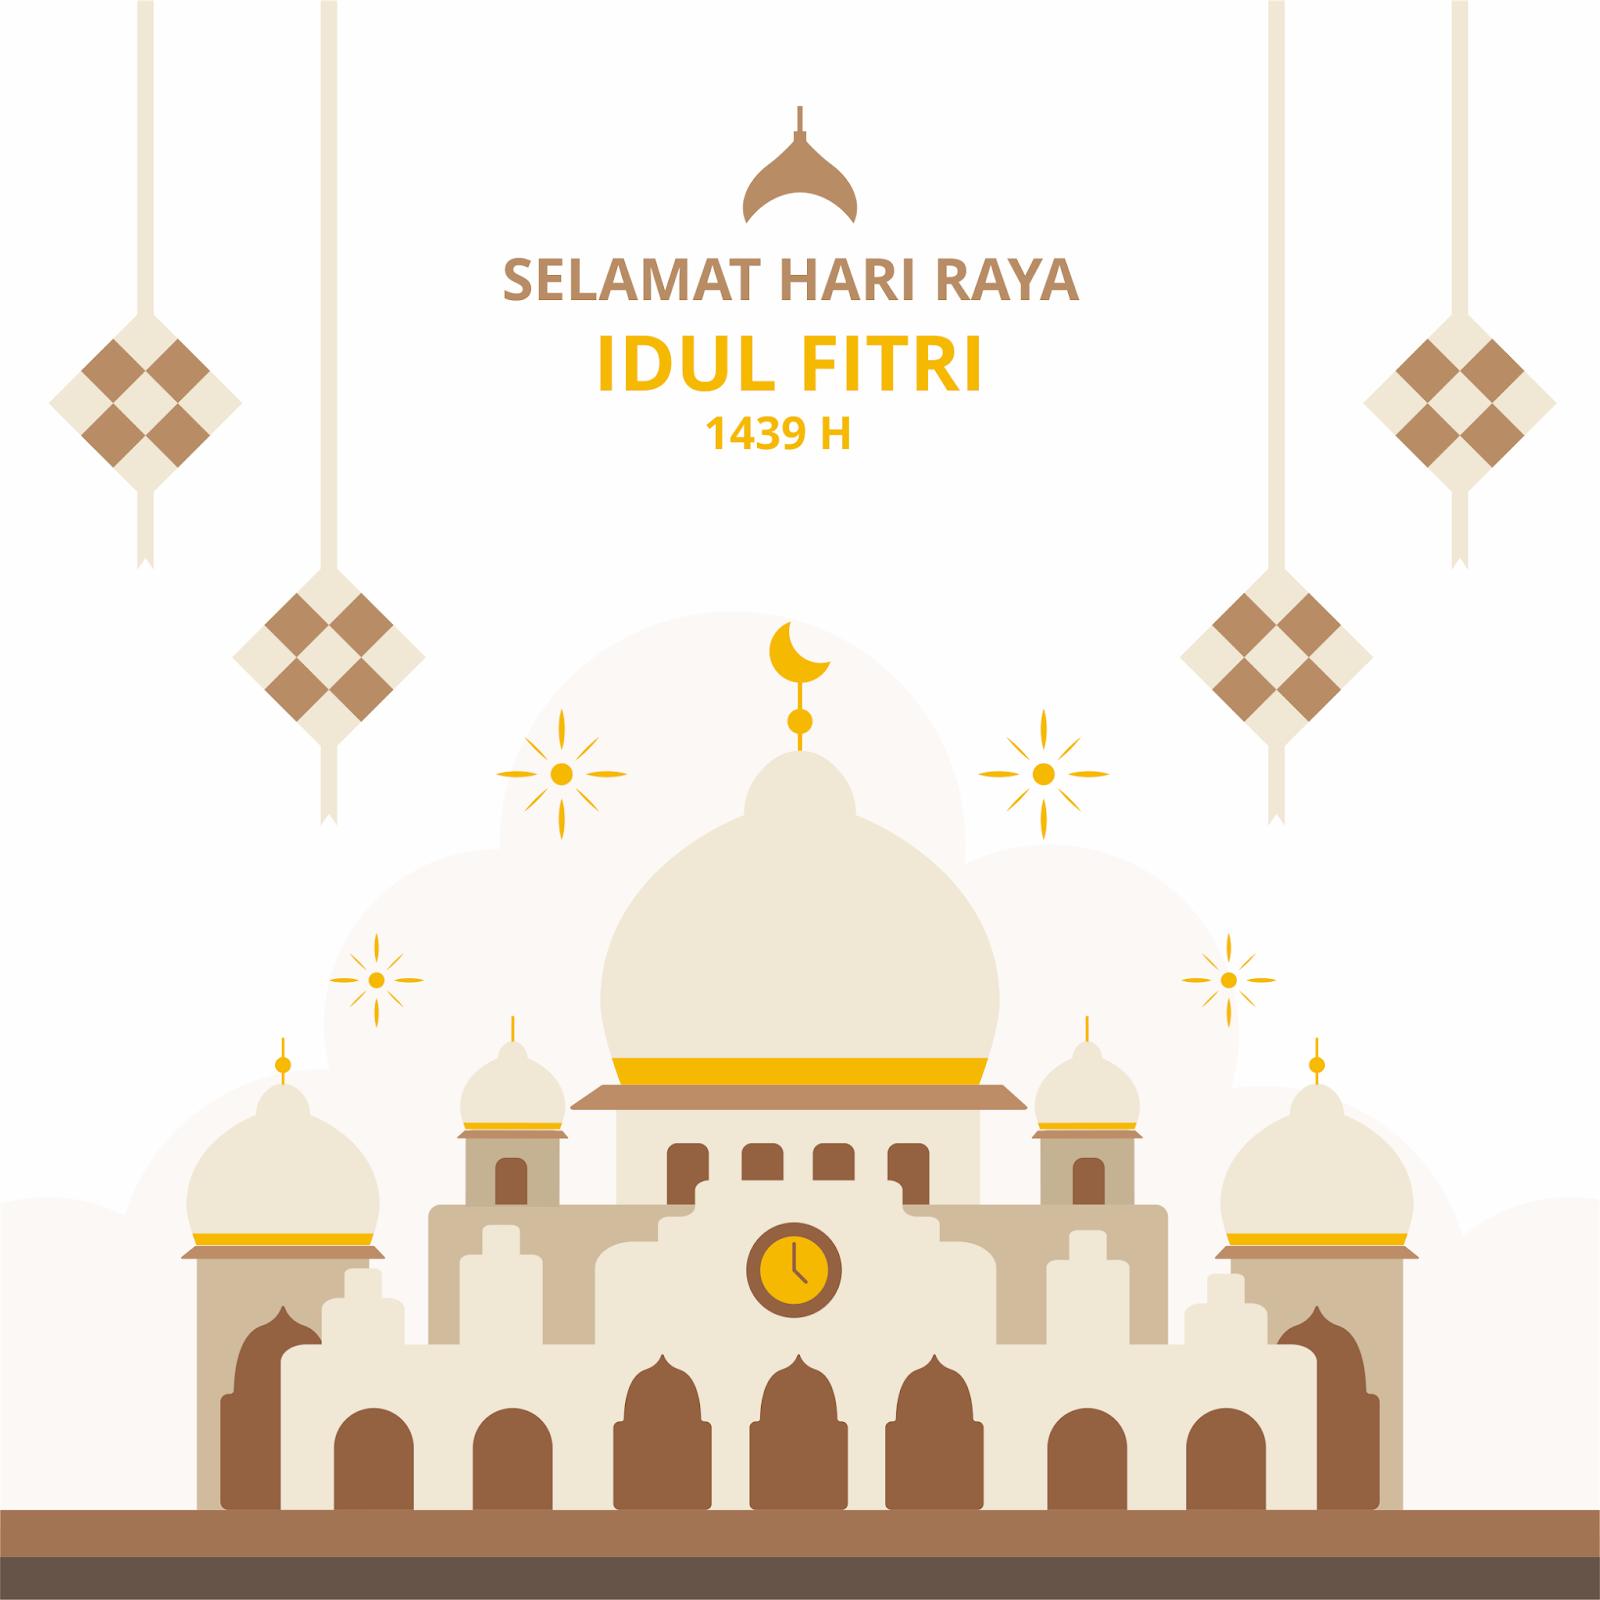 Download Desain Background Baliho Hari Raya Idul Fitri